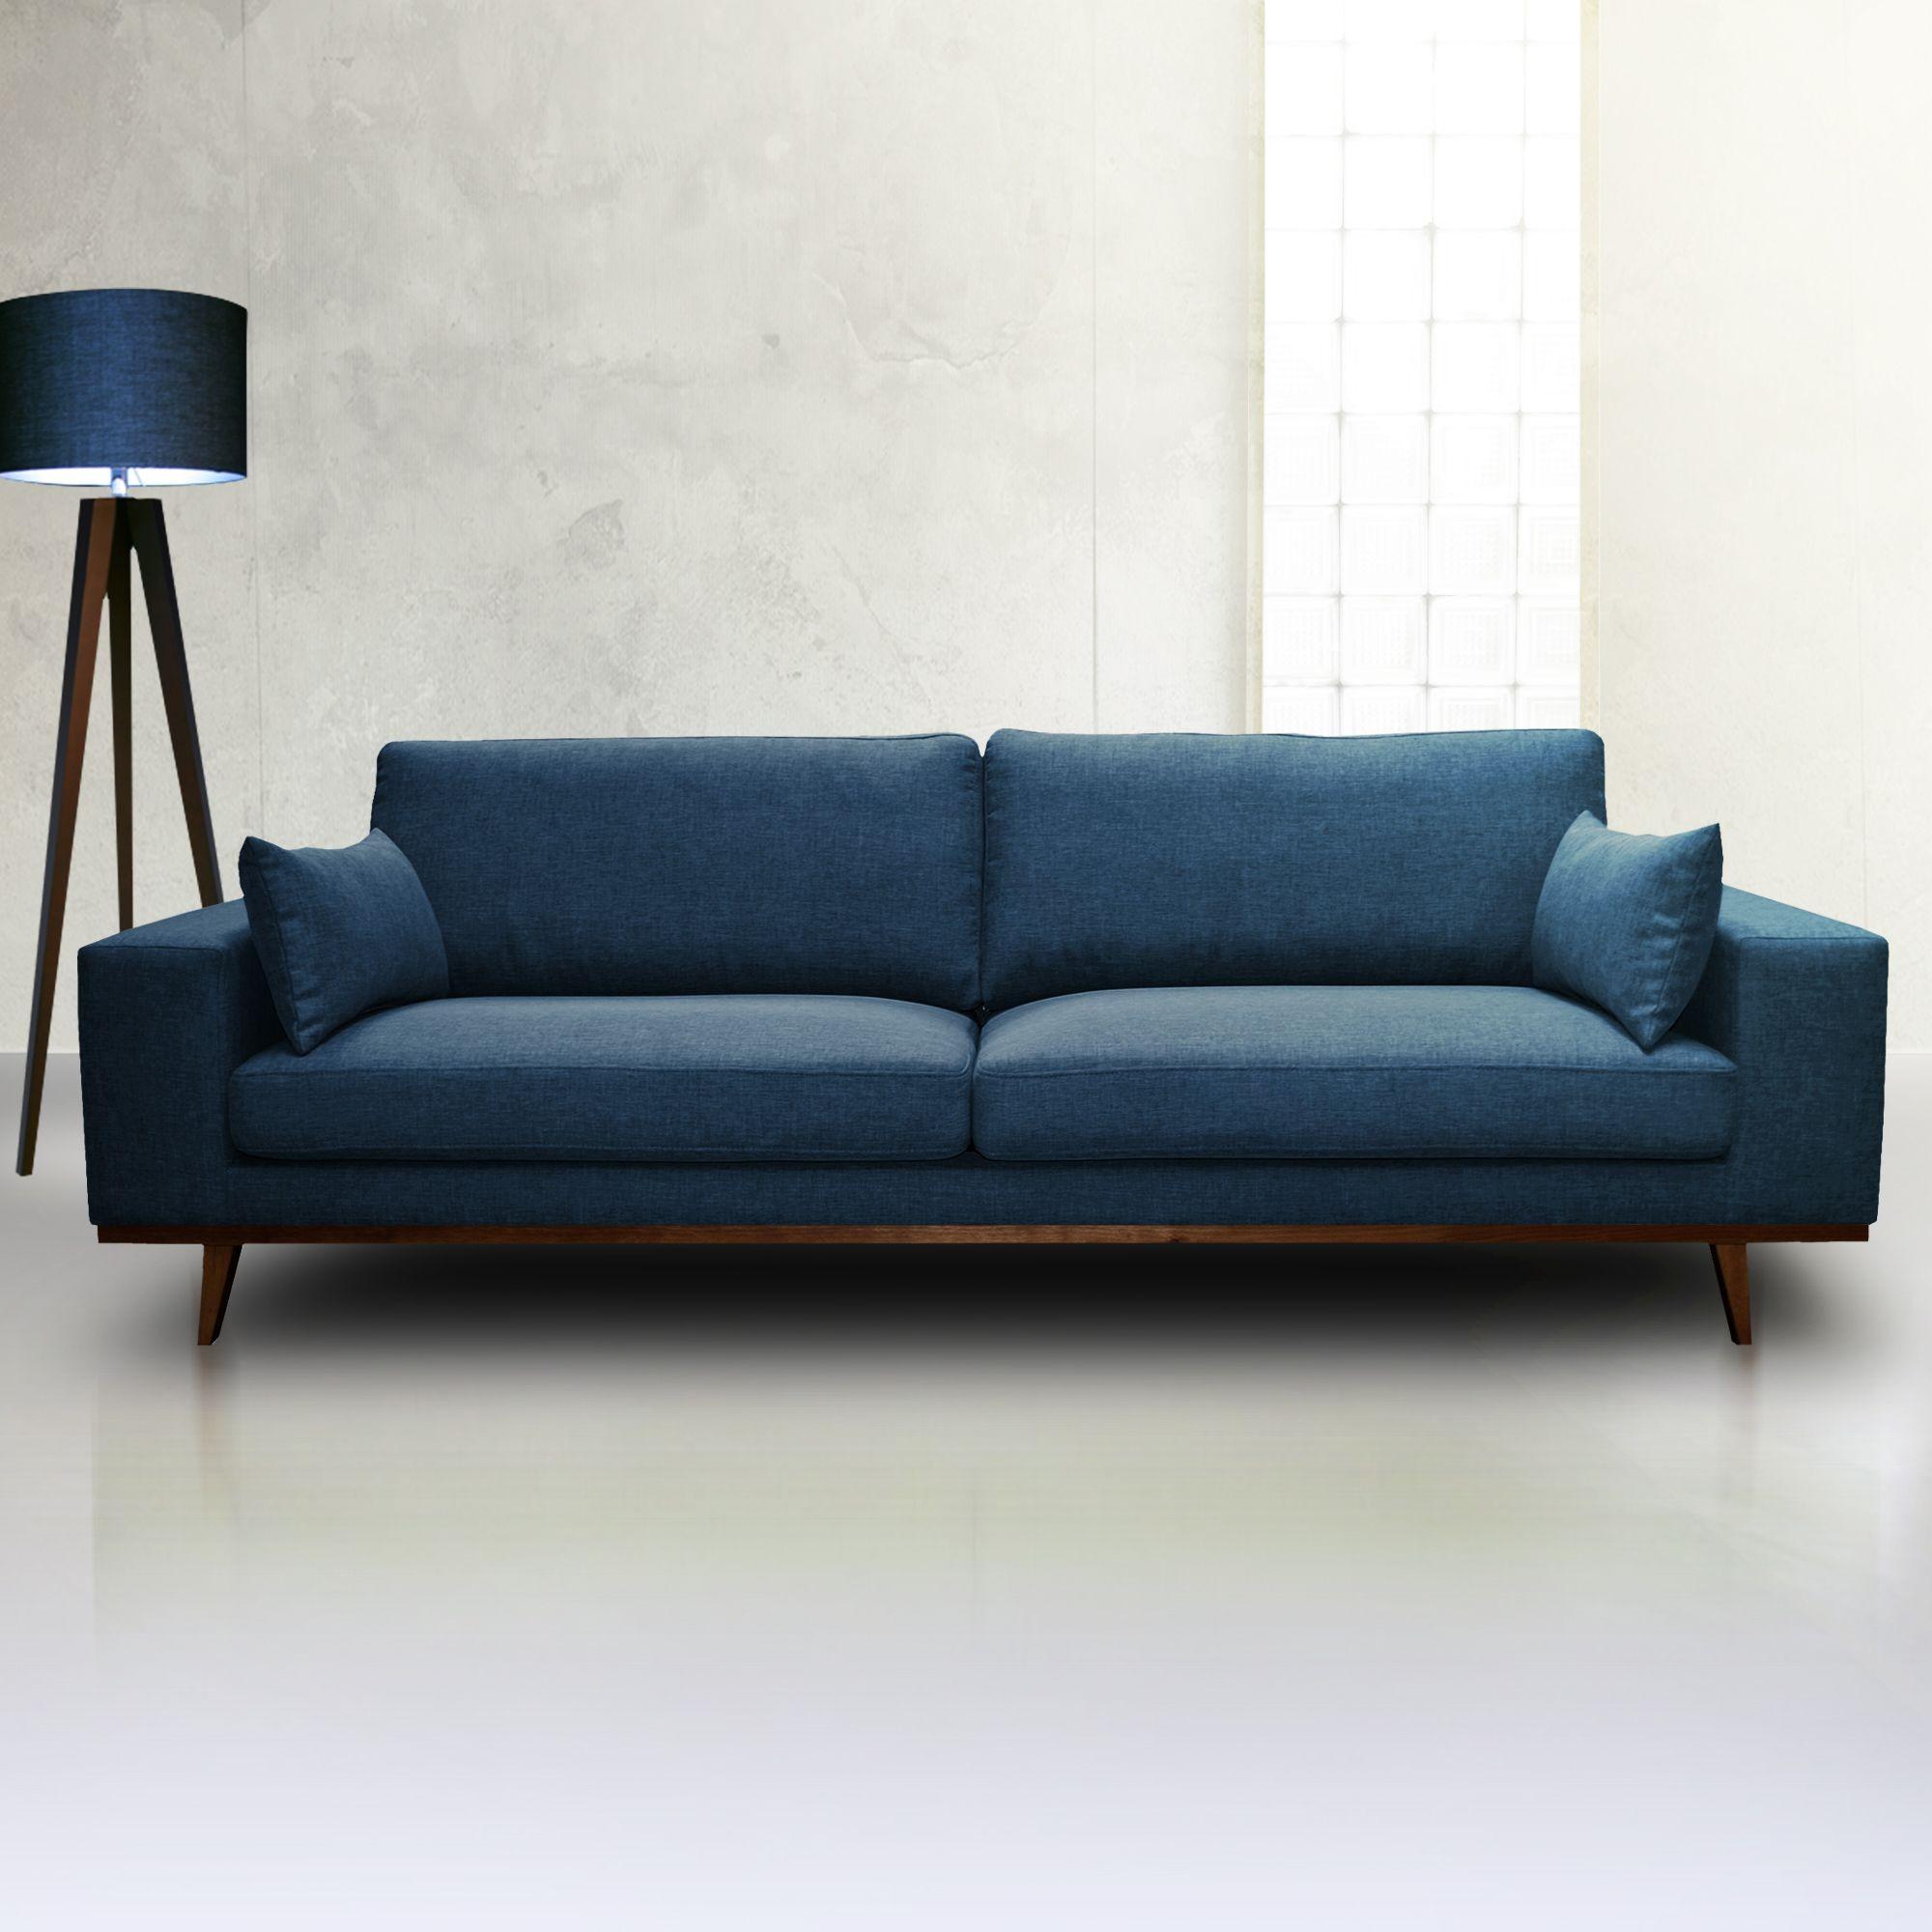 Canapé Cuir Convertible Ikea Inspirant Photos Lit Armoire Canapé Beautiful Canap En U Convertible 12 Full Canape D